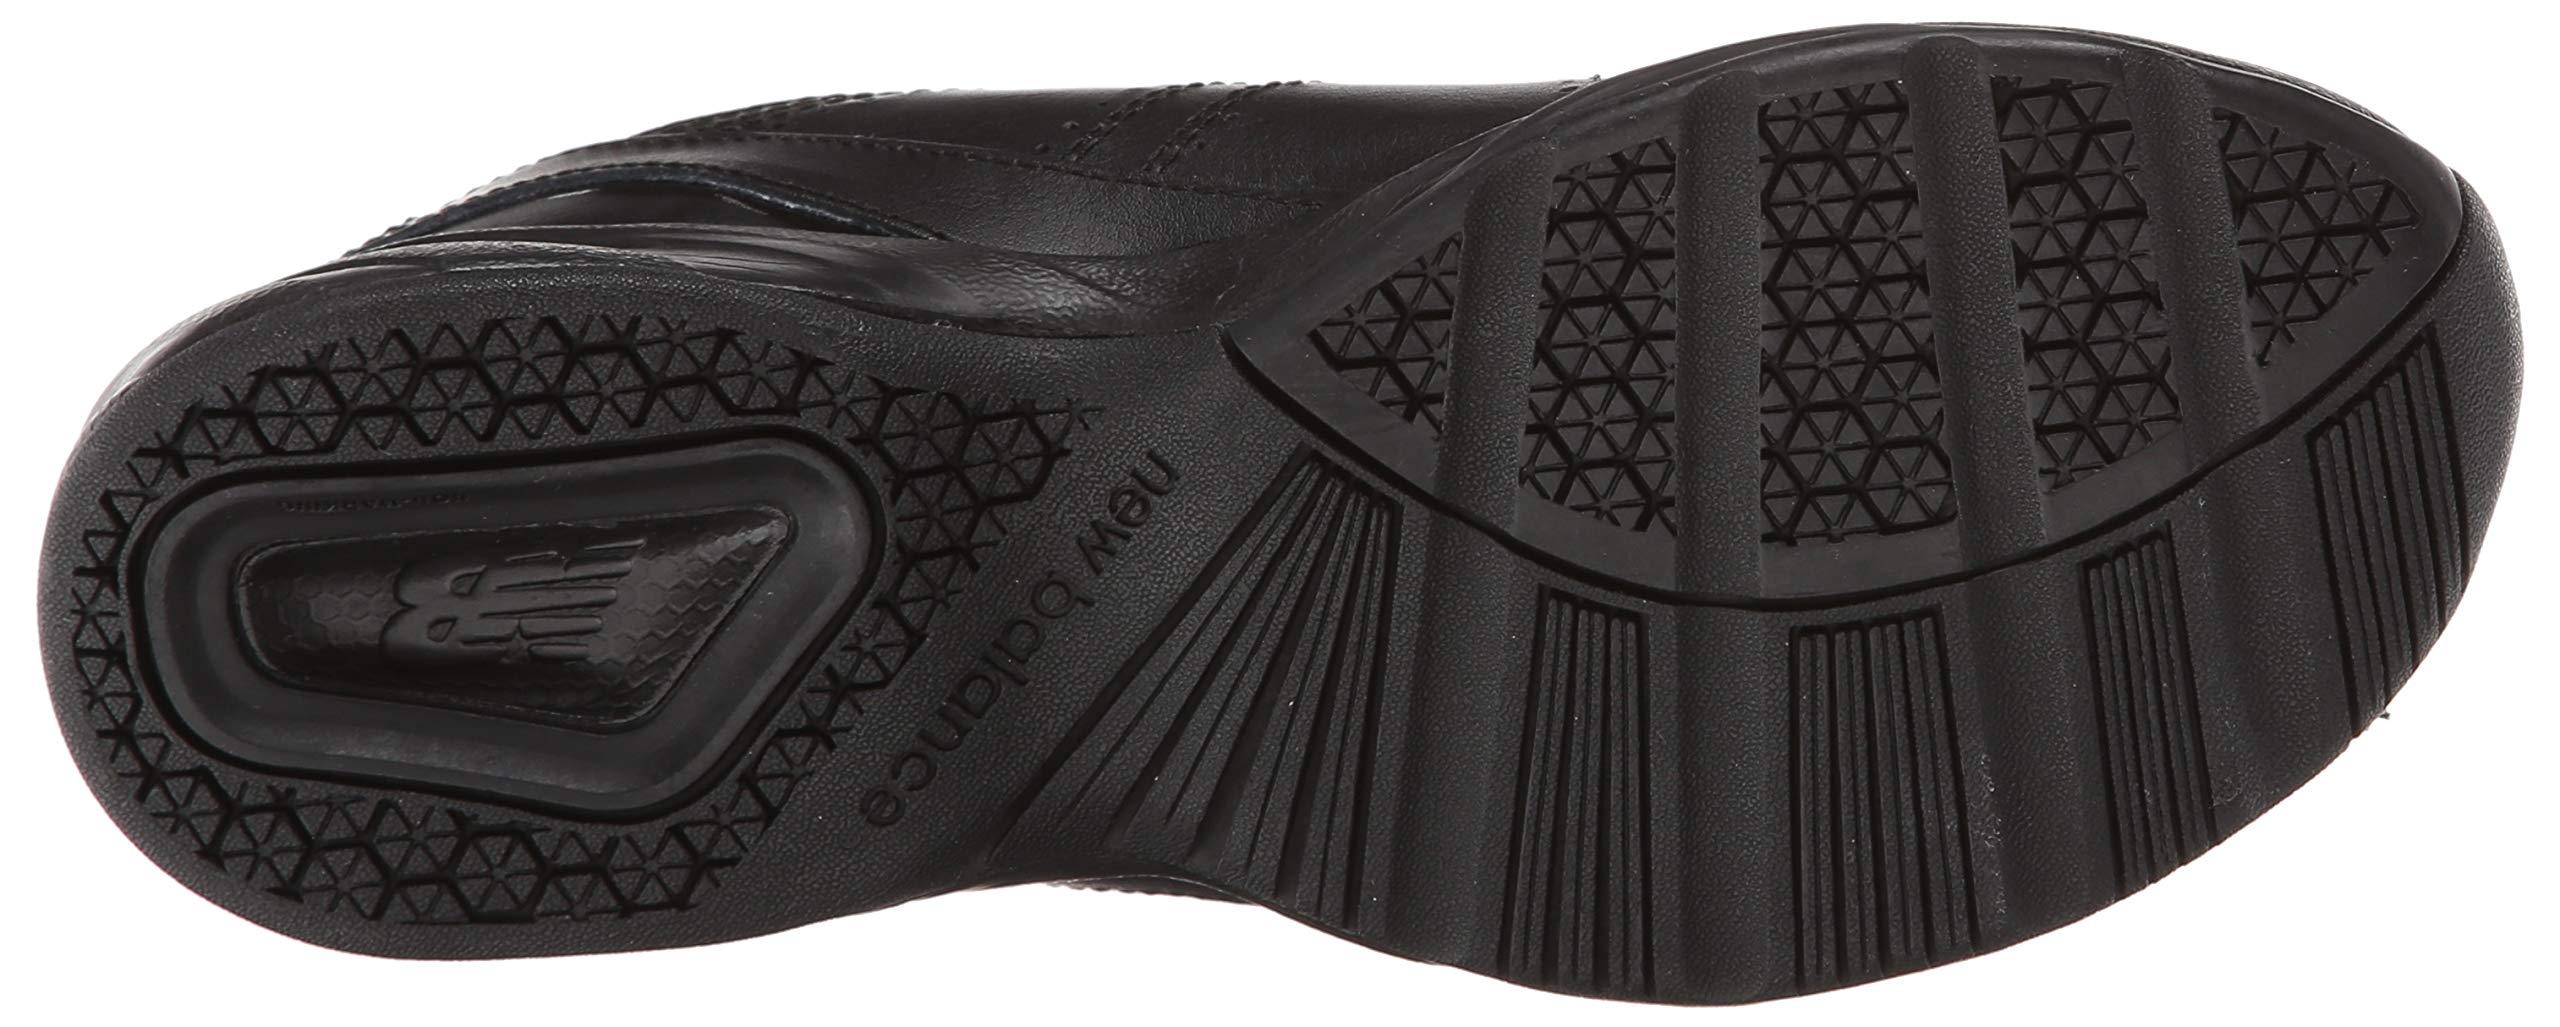 New Balance Boys KX624 Lace-Up Training Shoe ,Black,7 W US Big Kid by New Balance (Image #3)